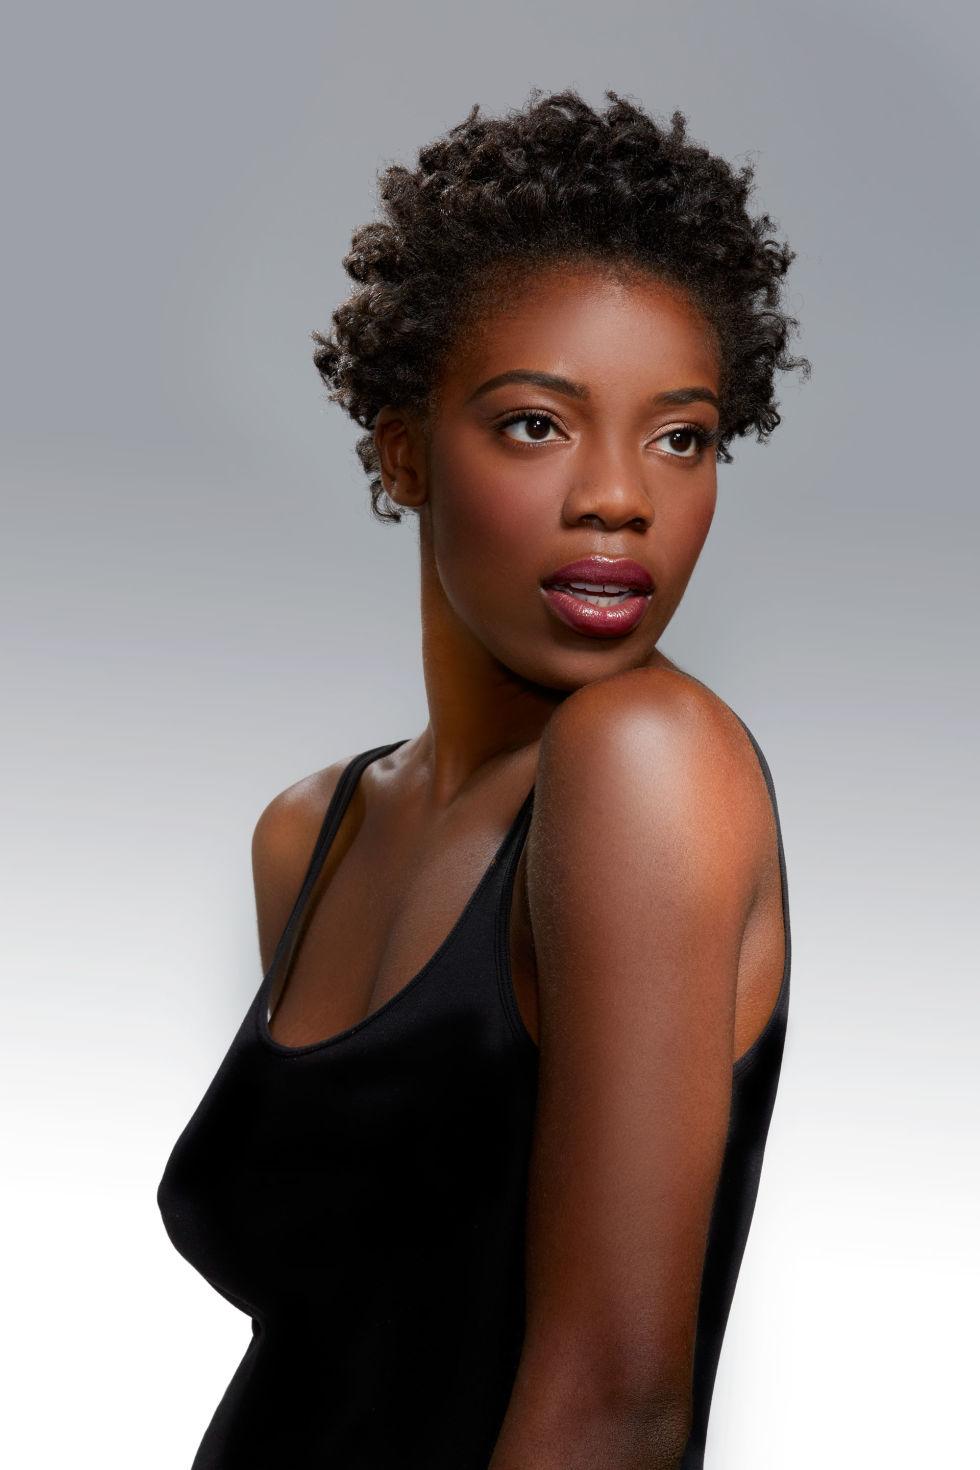 Fine 29 Black Hairstyles Best African American Hairstyles Amp Haircuts Short Hairstyles For Black Women Fulllsitofus